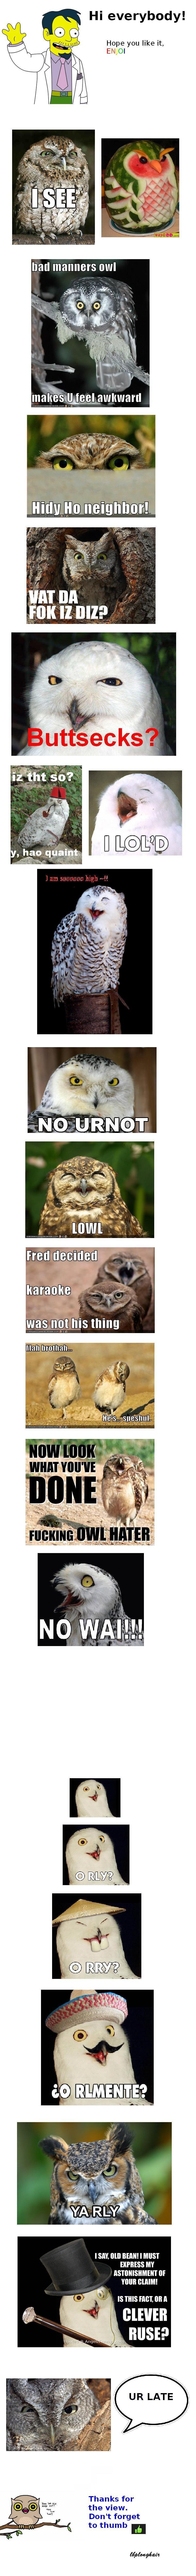 Funny Owl Compilation. Hope you like. <br /> Ya rly.. Hi everybody! Hope you like it, EN OI Ill, i! neighbor! Inn nu you llolol? 4 Fred decided karaoke .  owl compilation funny lol